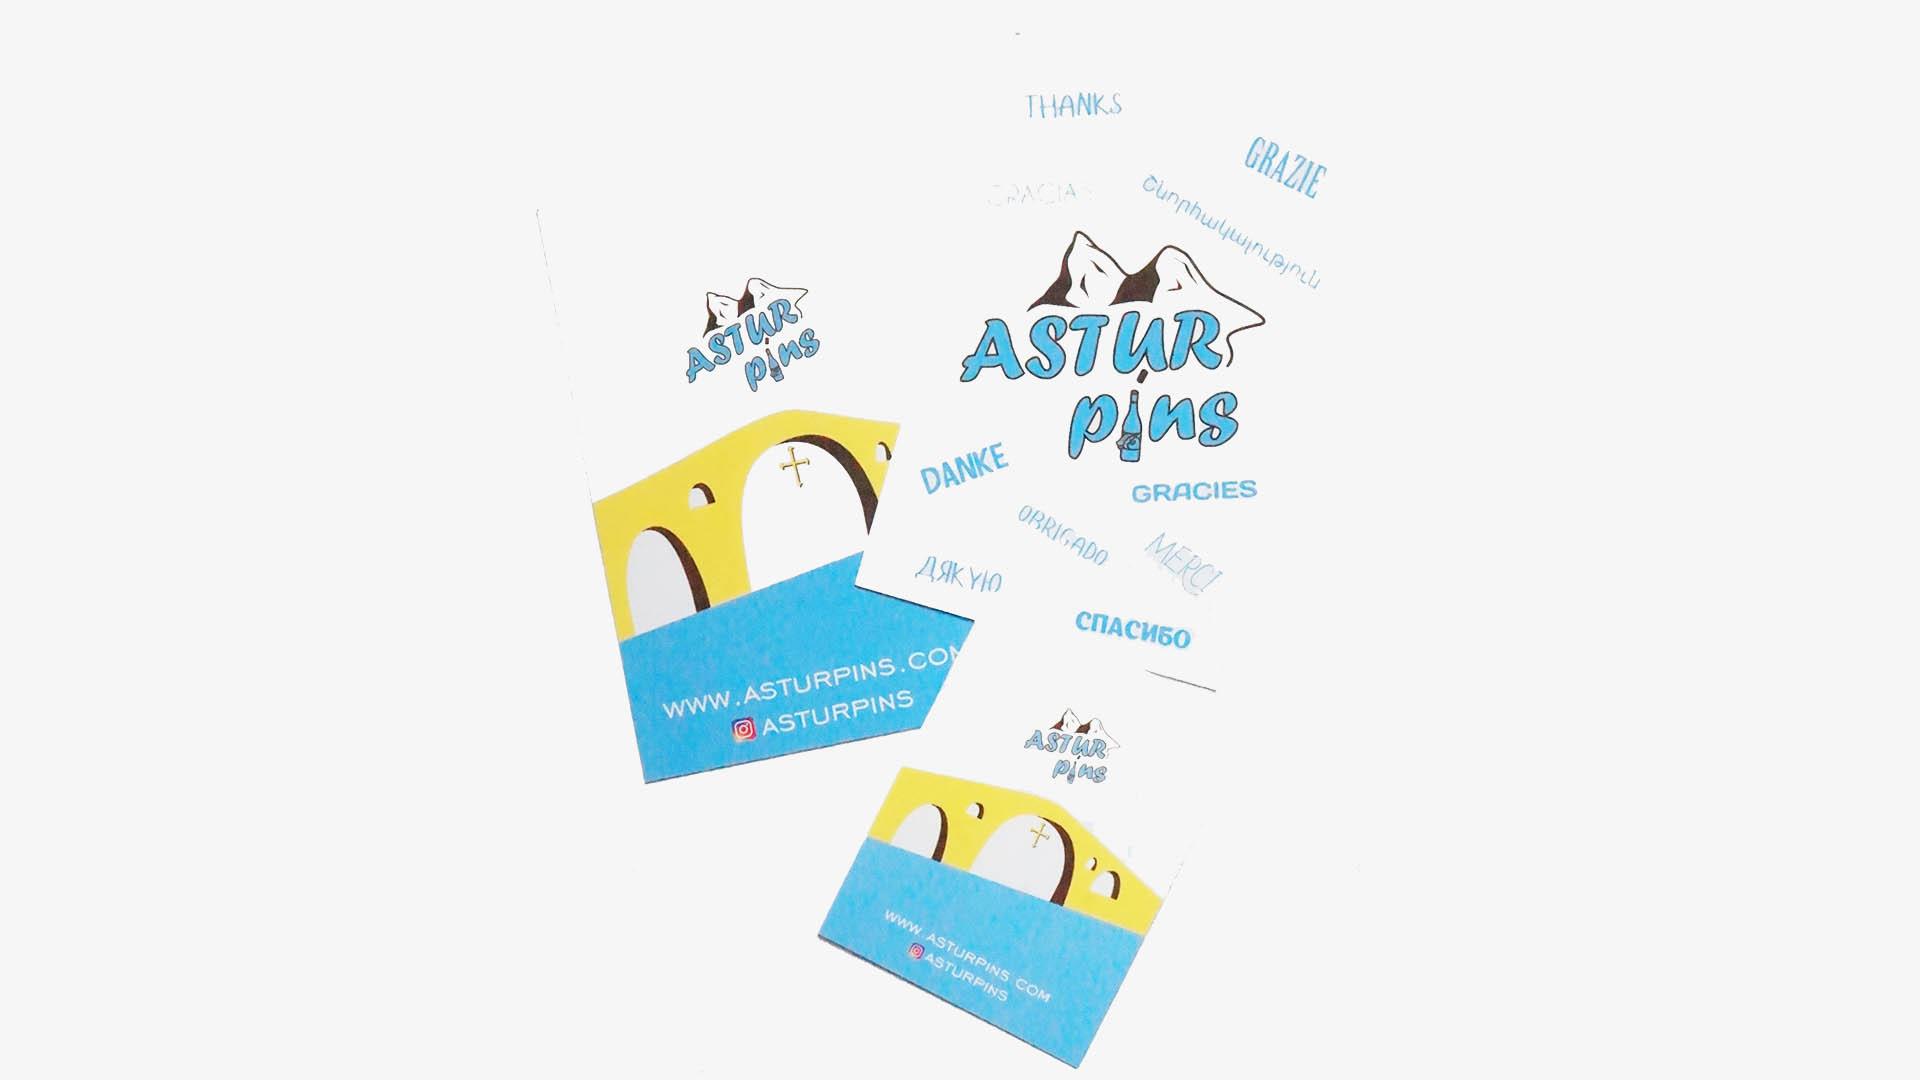 astur pins cards